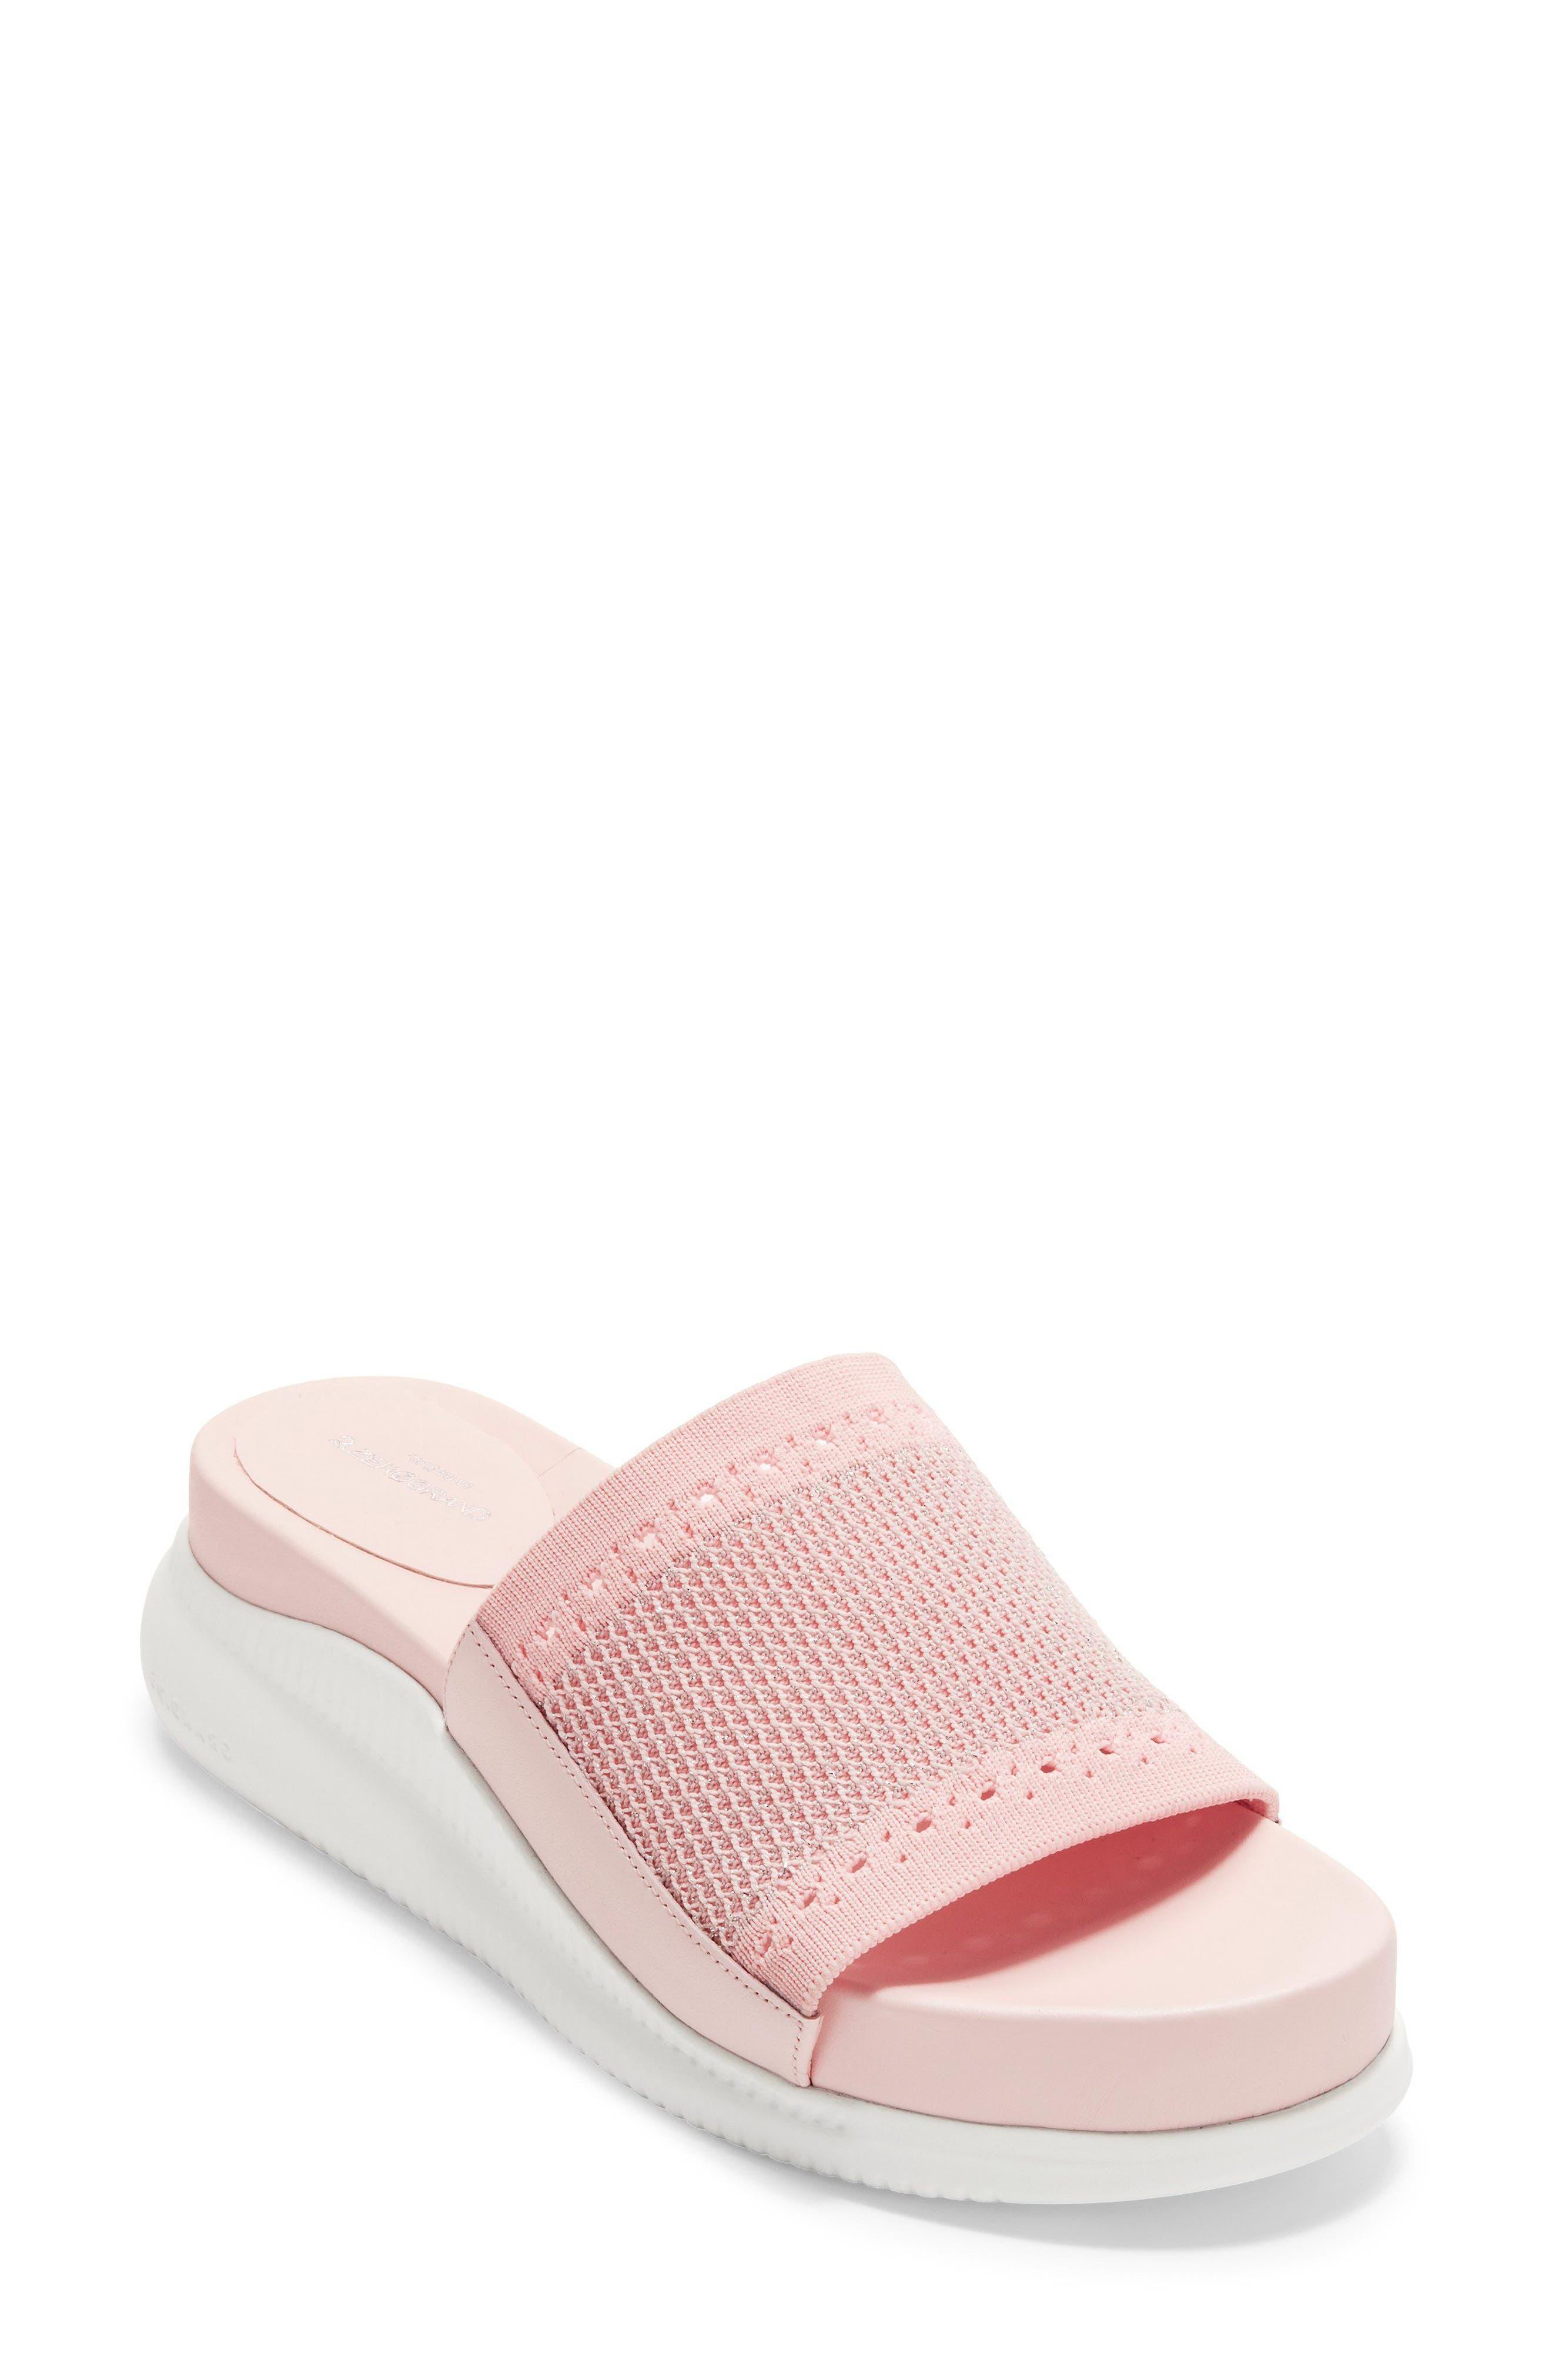 Cole Haan 2.zerogrand Stitchlite(TM) Slide Sandal- Pink